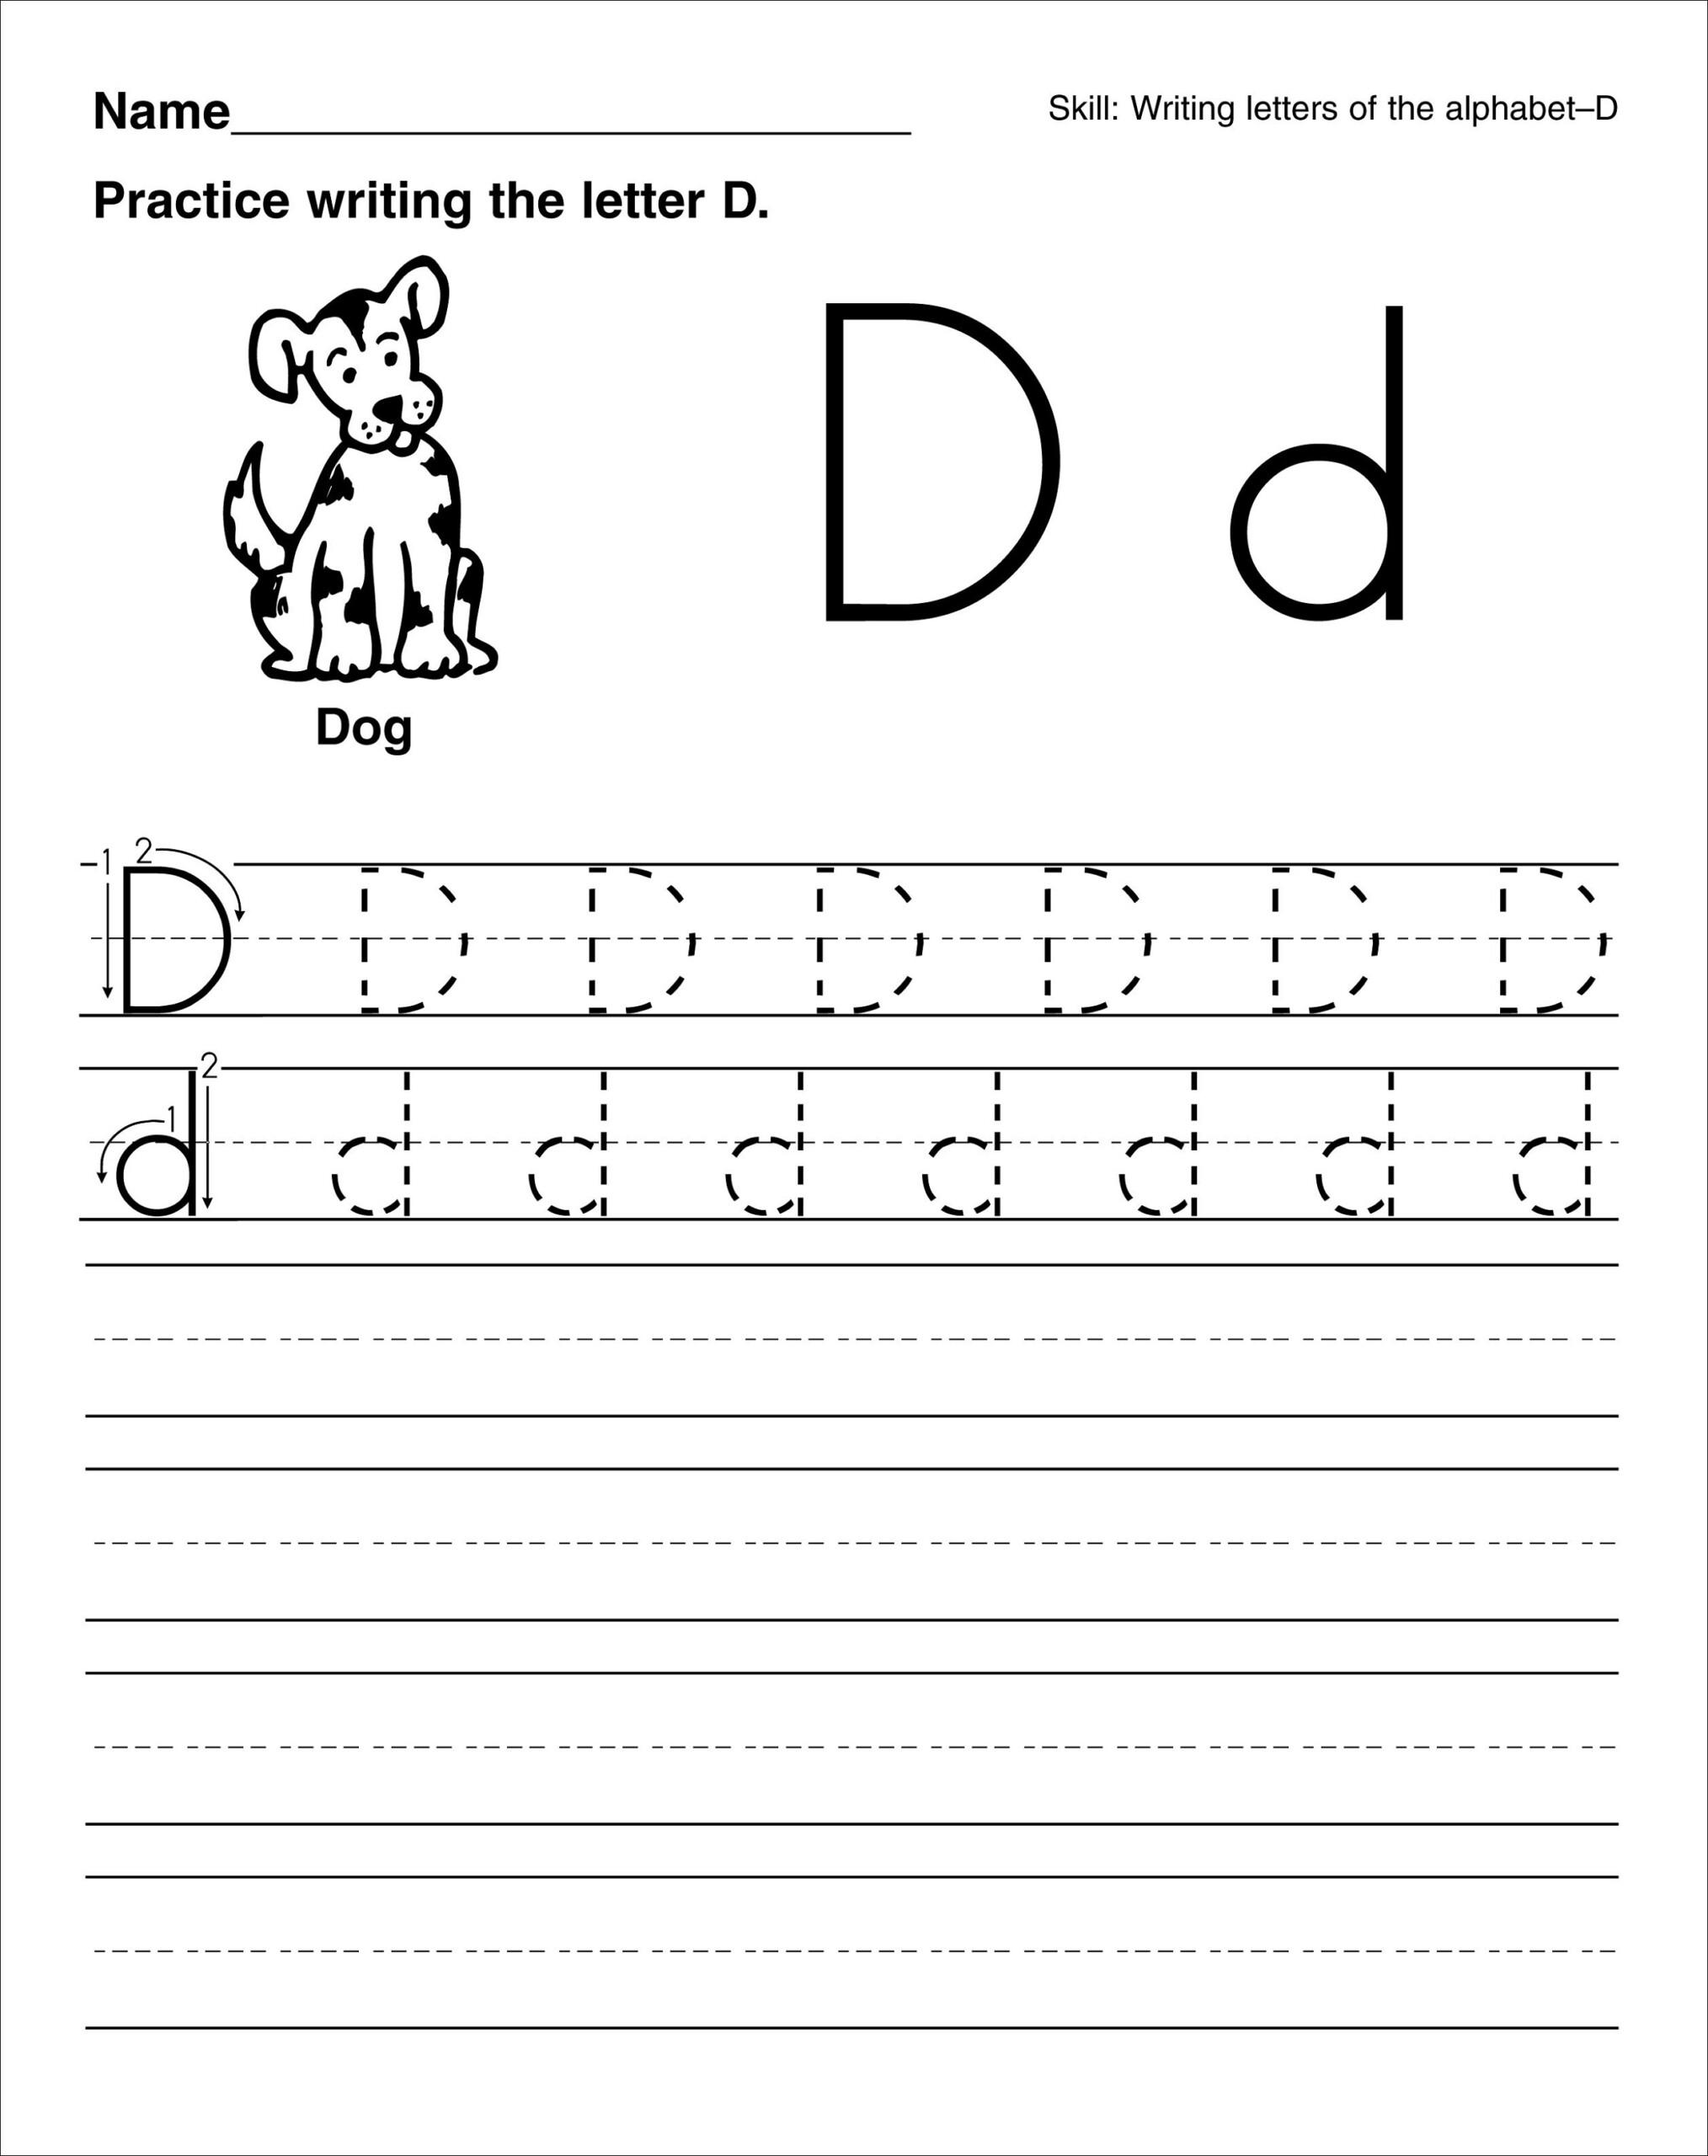 Forming Letters Worksheets | Printable Worksheets And throughout Letter H Worksheets Sparklebox